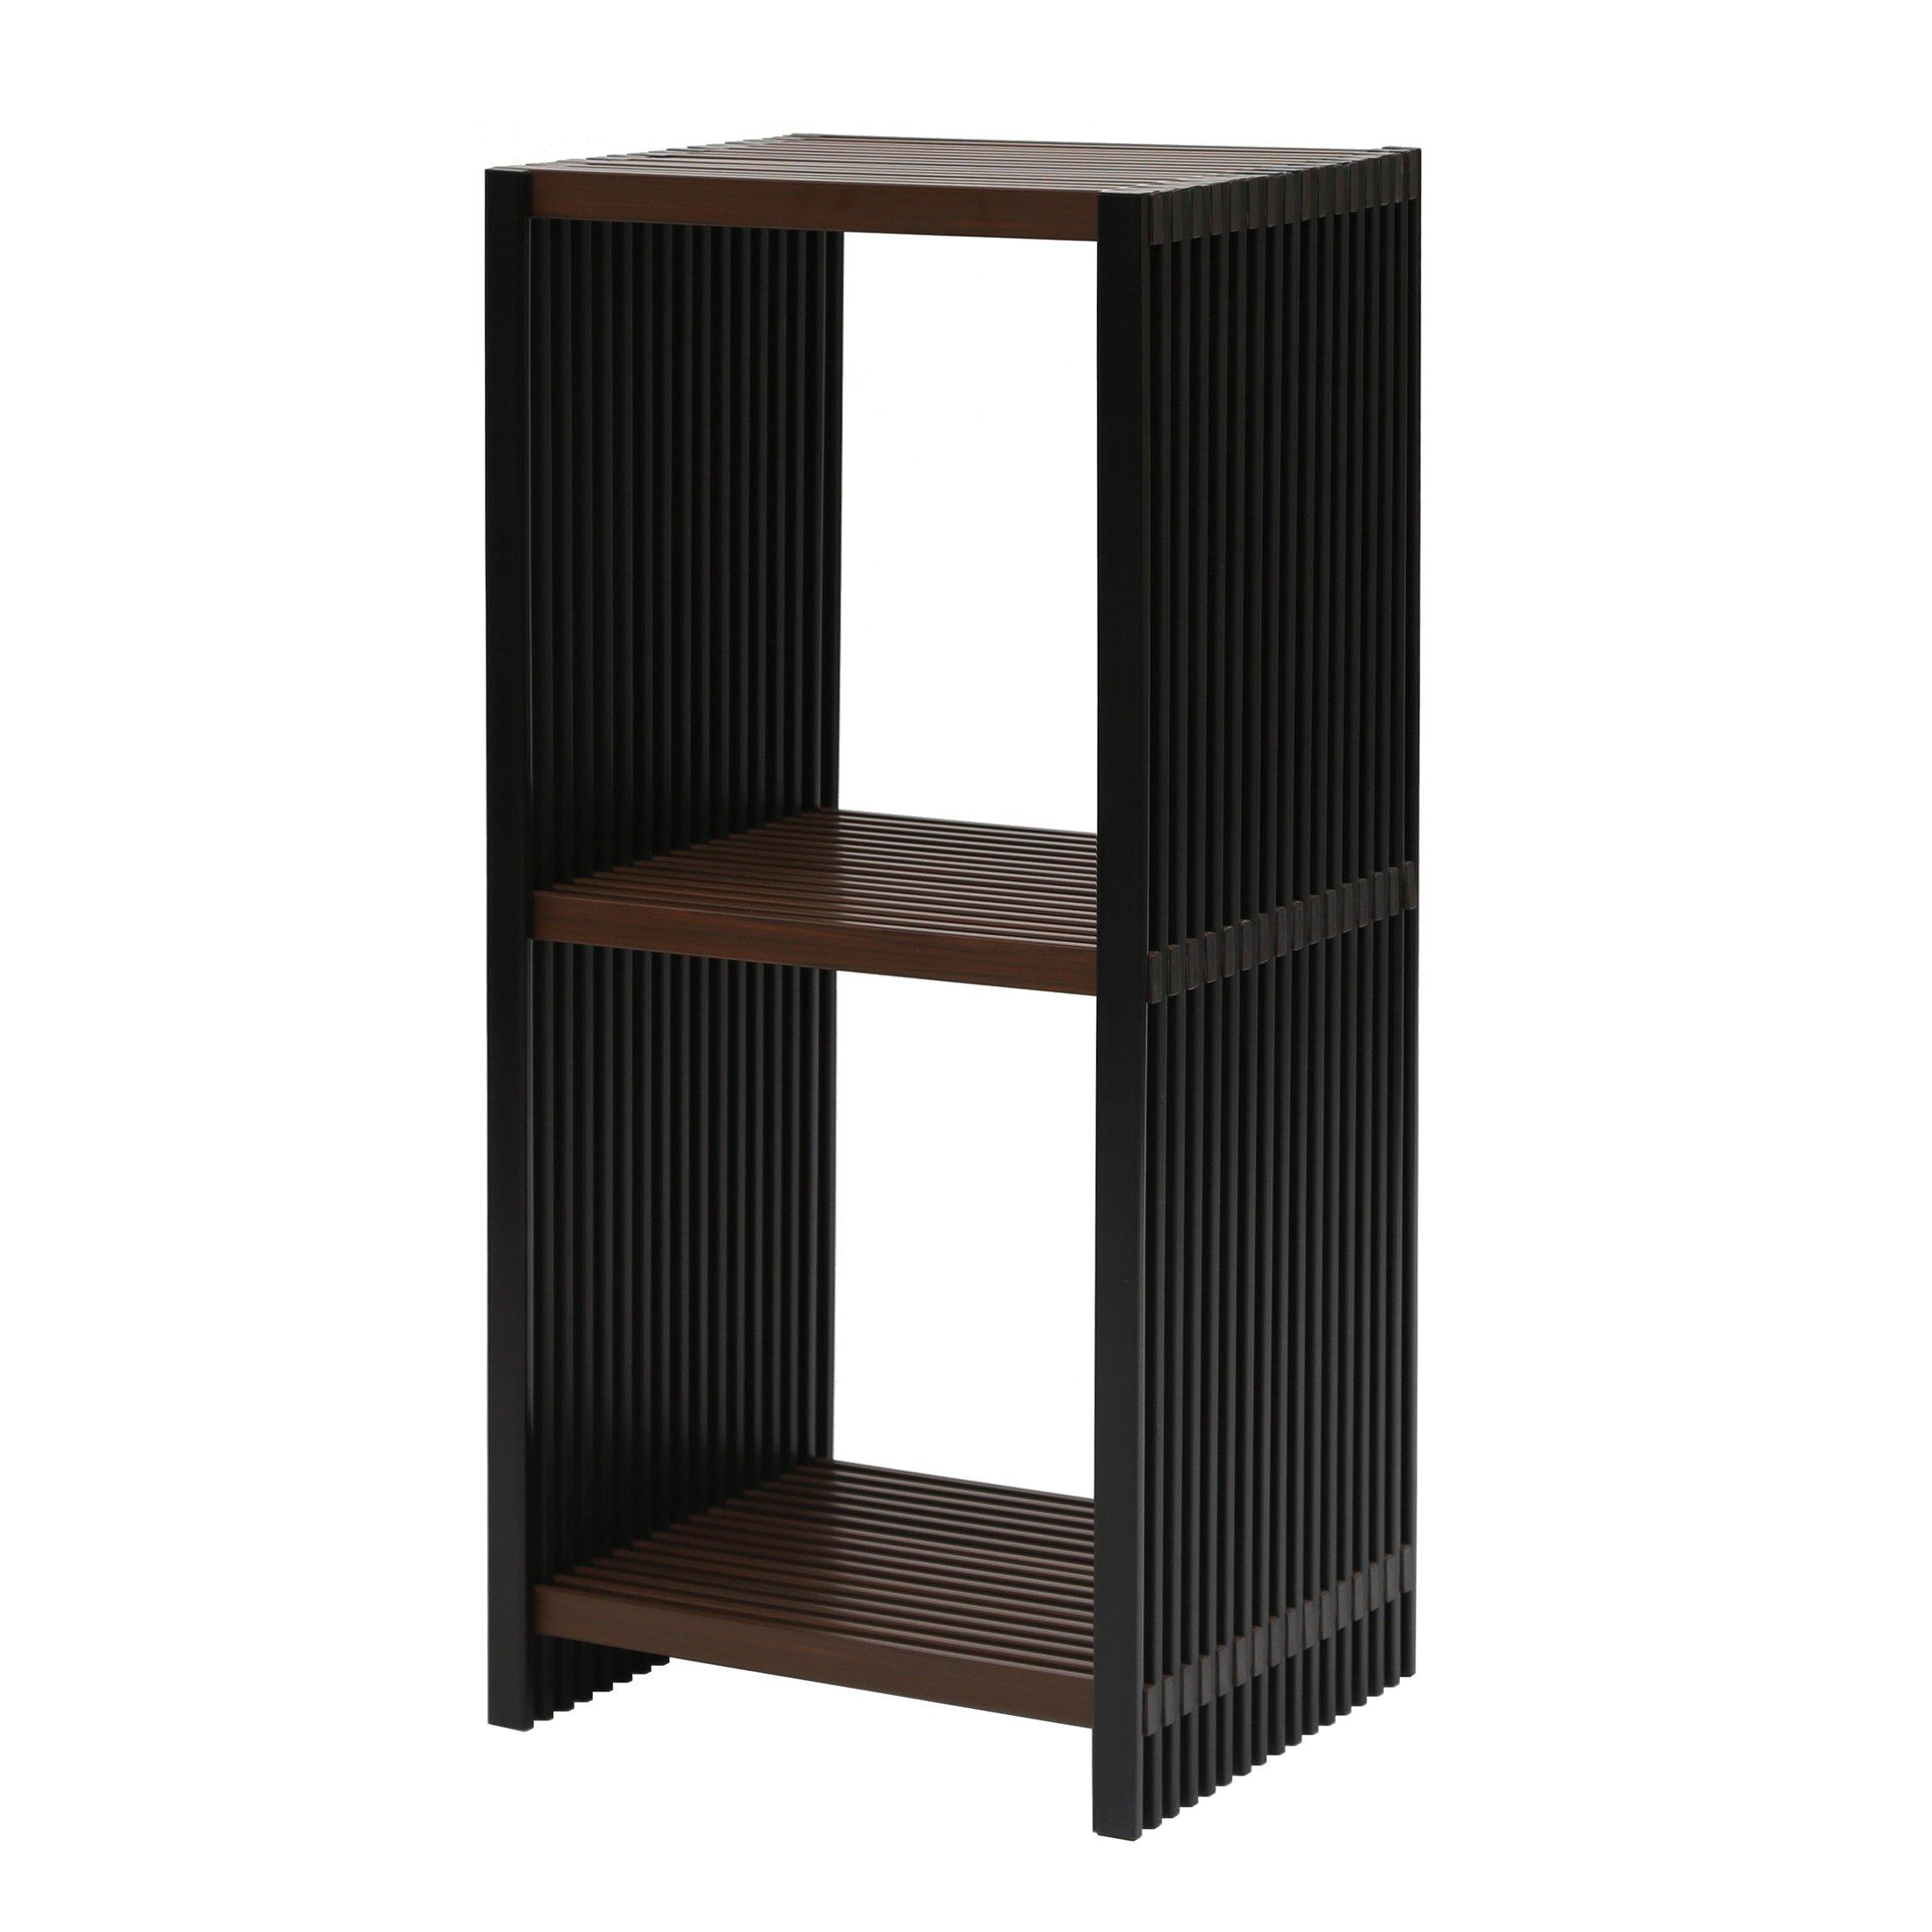 Seville Classics 3-Tier Two-Tone Folding Cube Bookcase Shelf, Ebony & Walnut